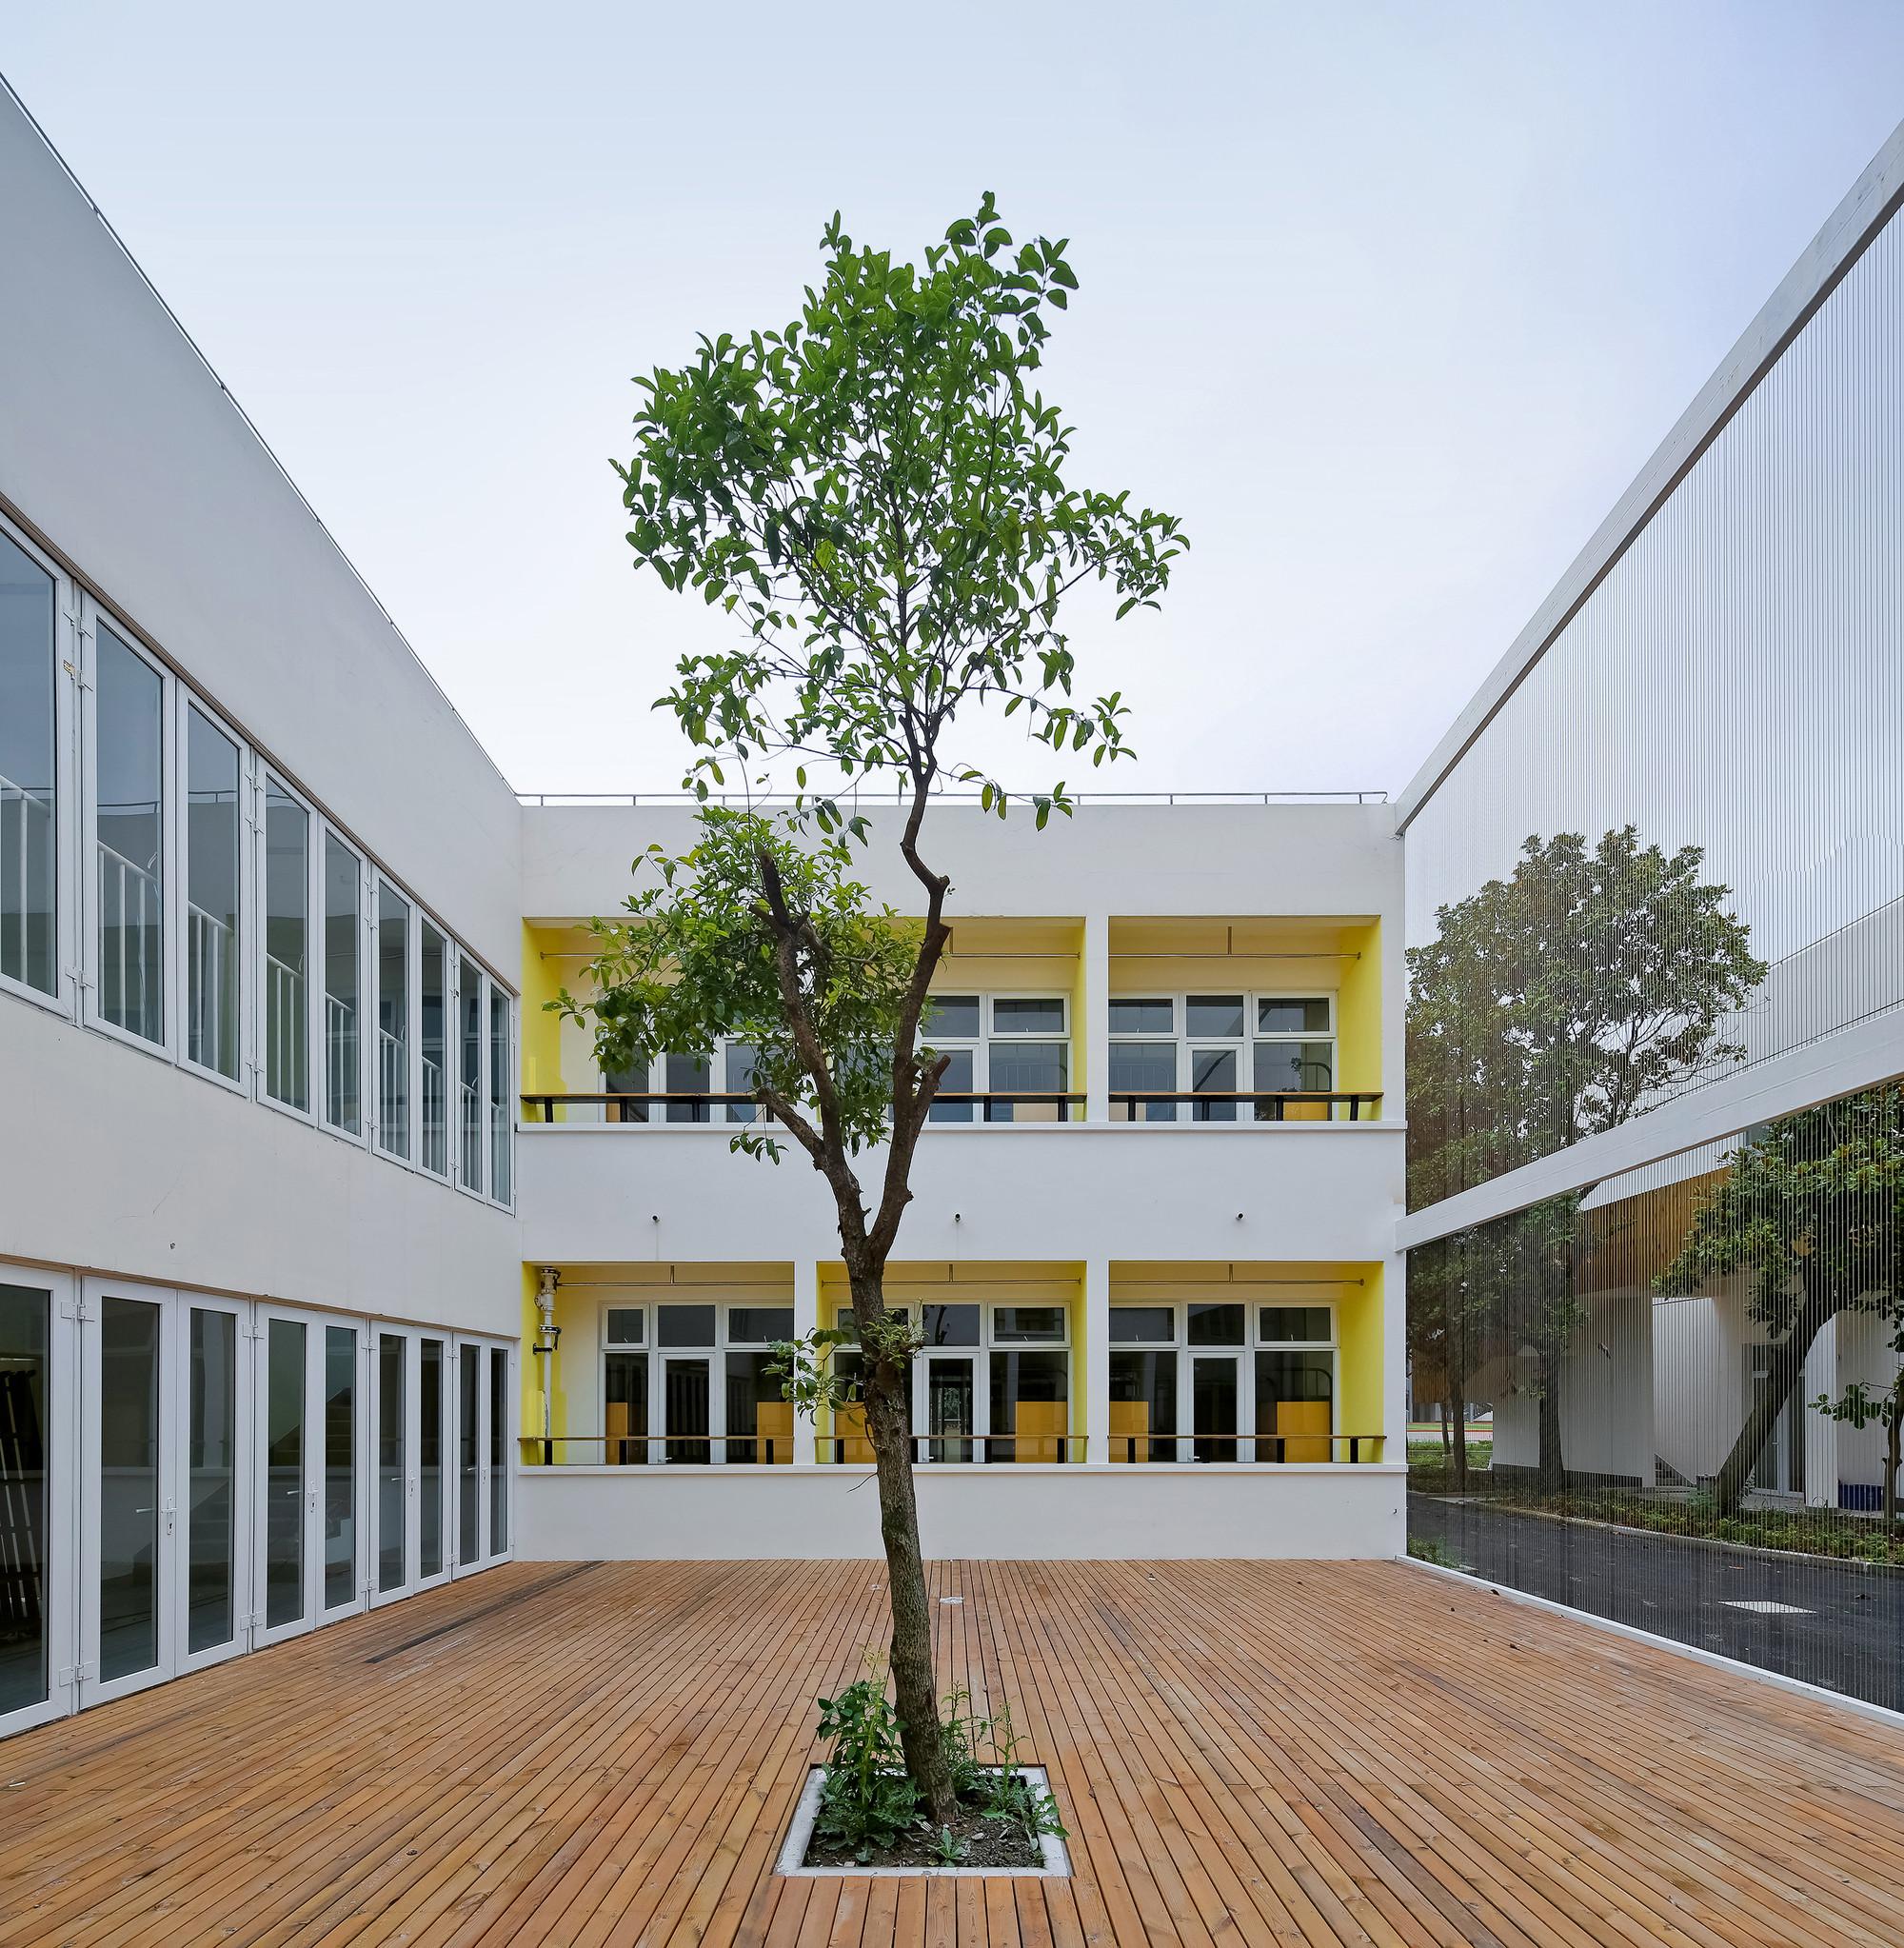 Student Accommodation / Wuyang Architecture